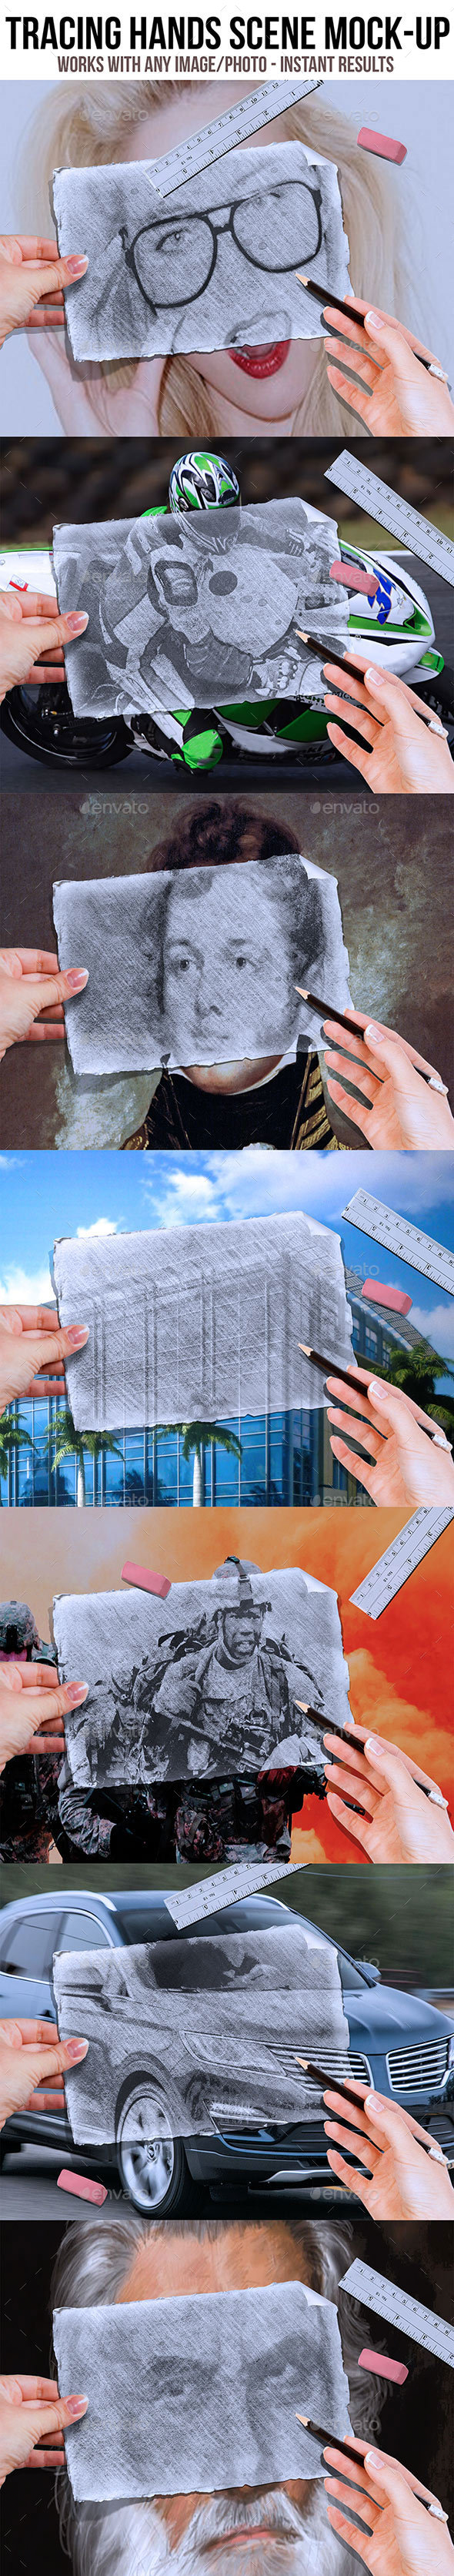 Tracing Hands Scene MockUp - Miscellaneous Photo Templates